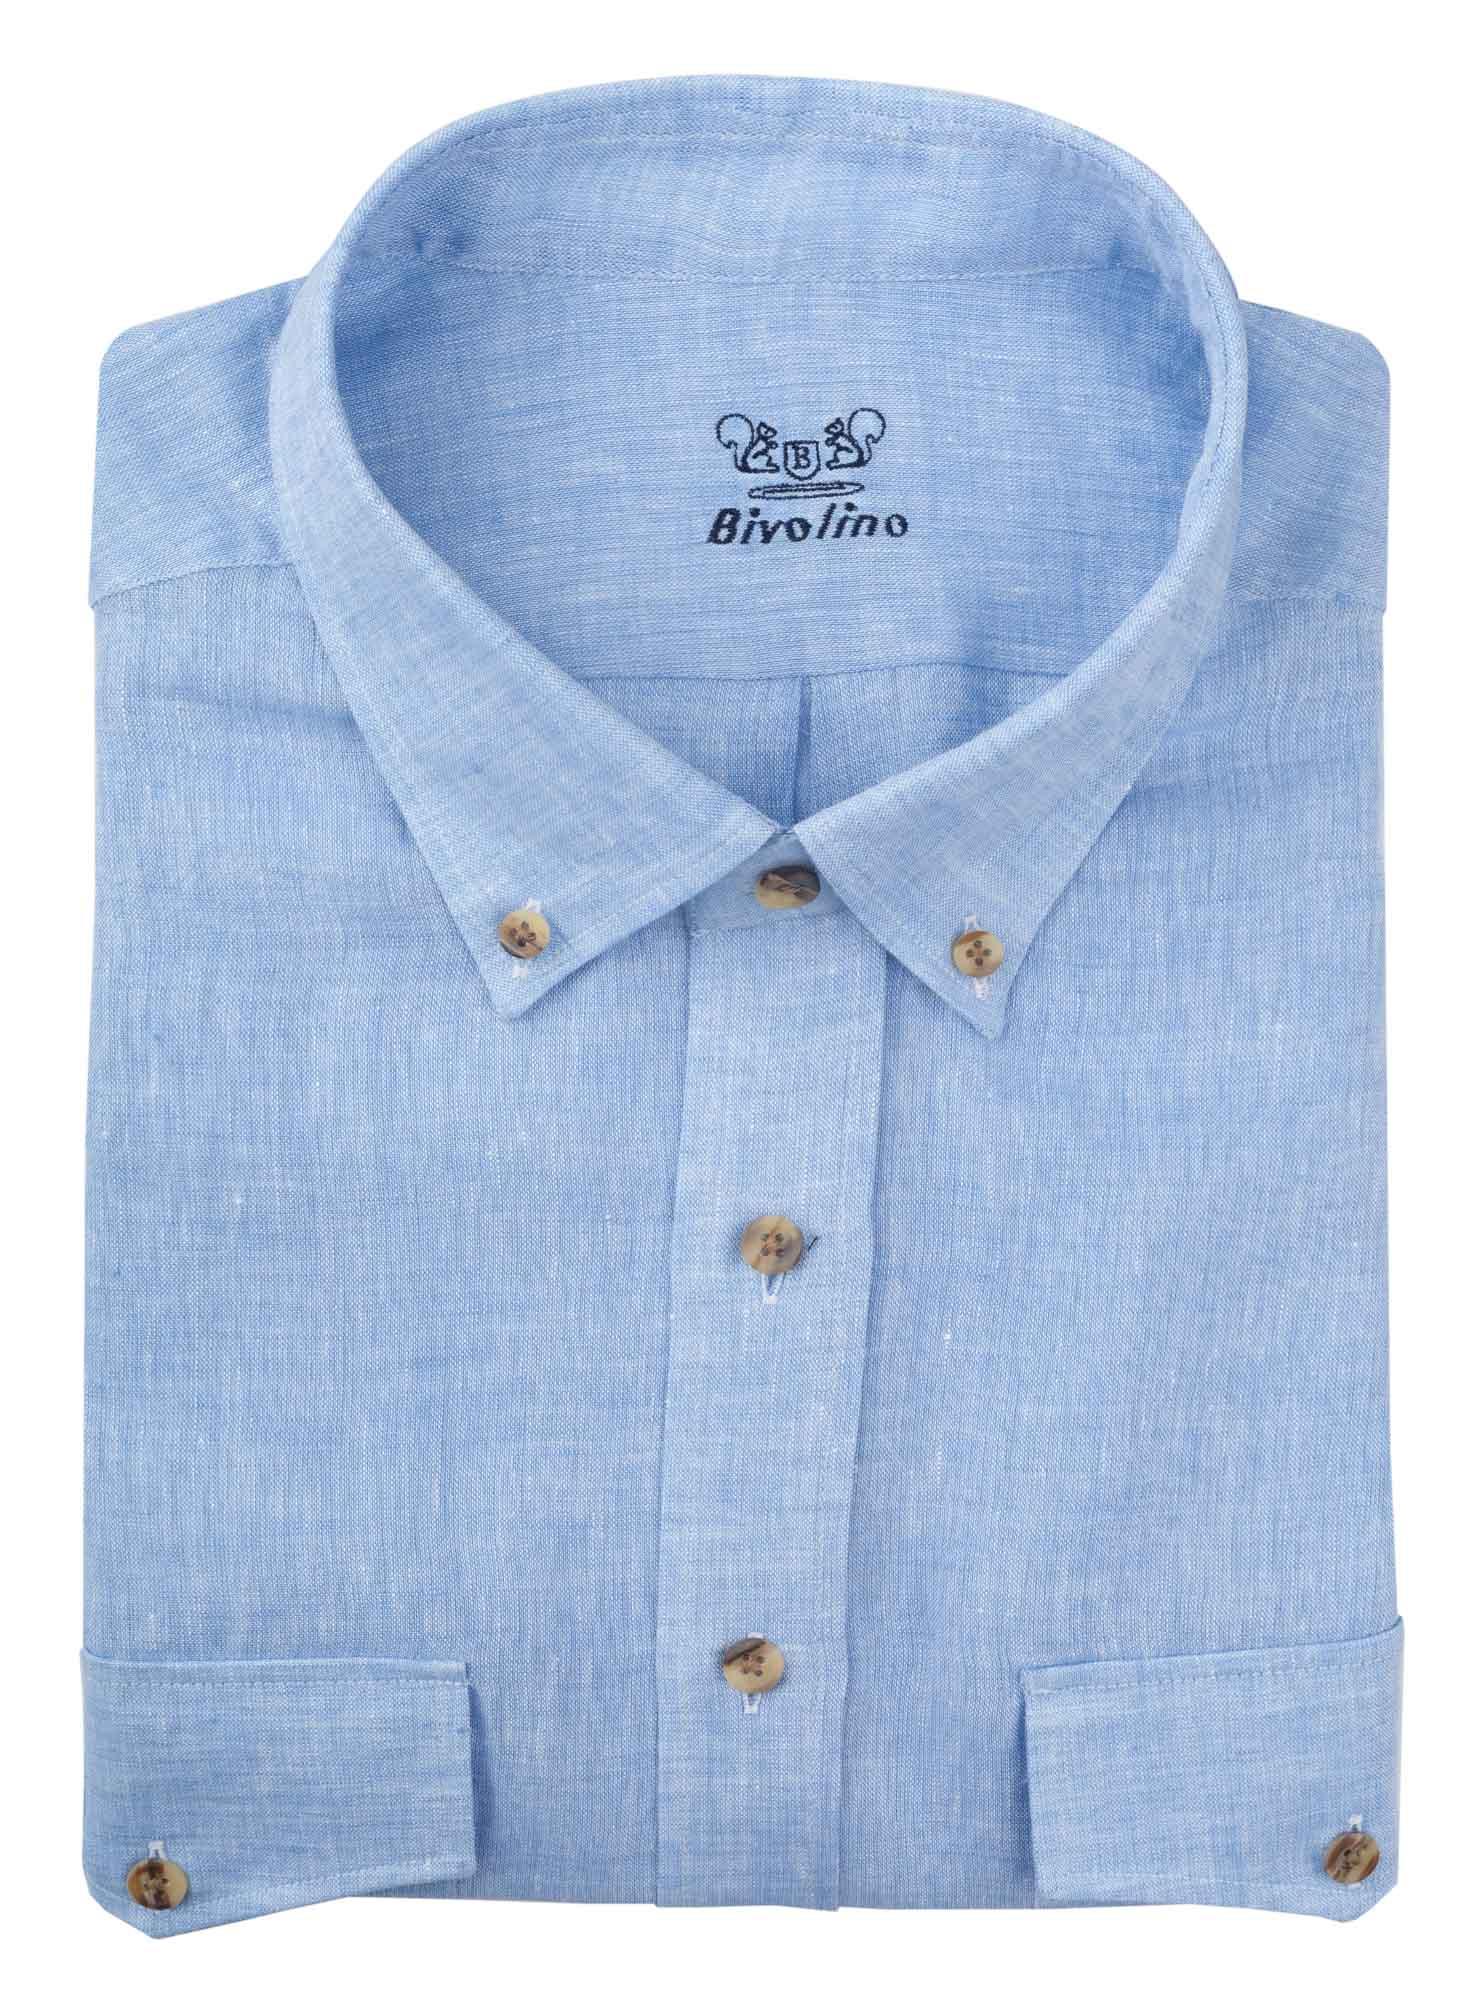 SORINI - smart casual linen blue shirt - Sera 2